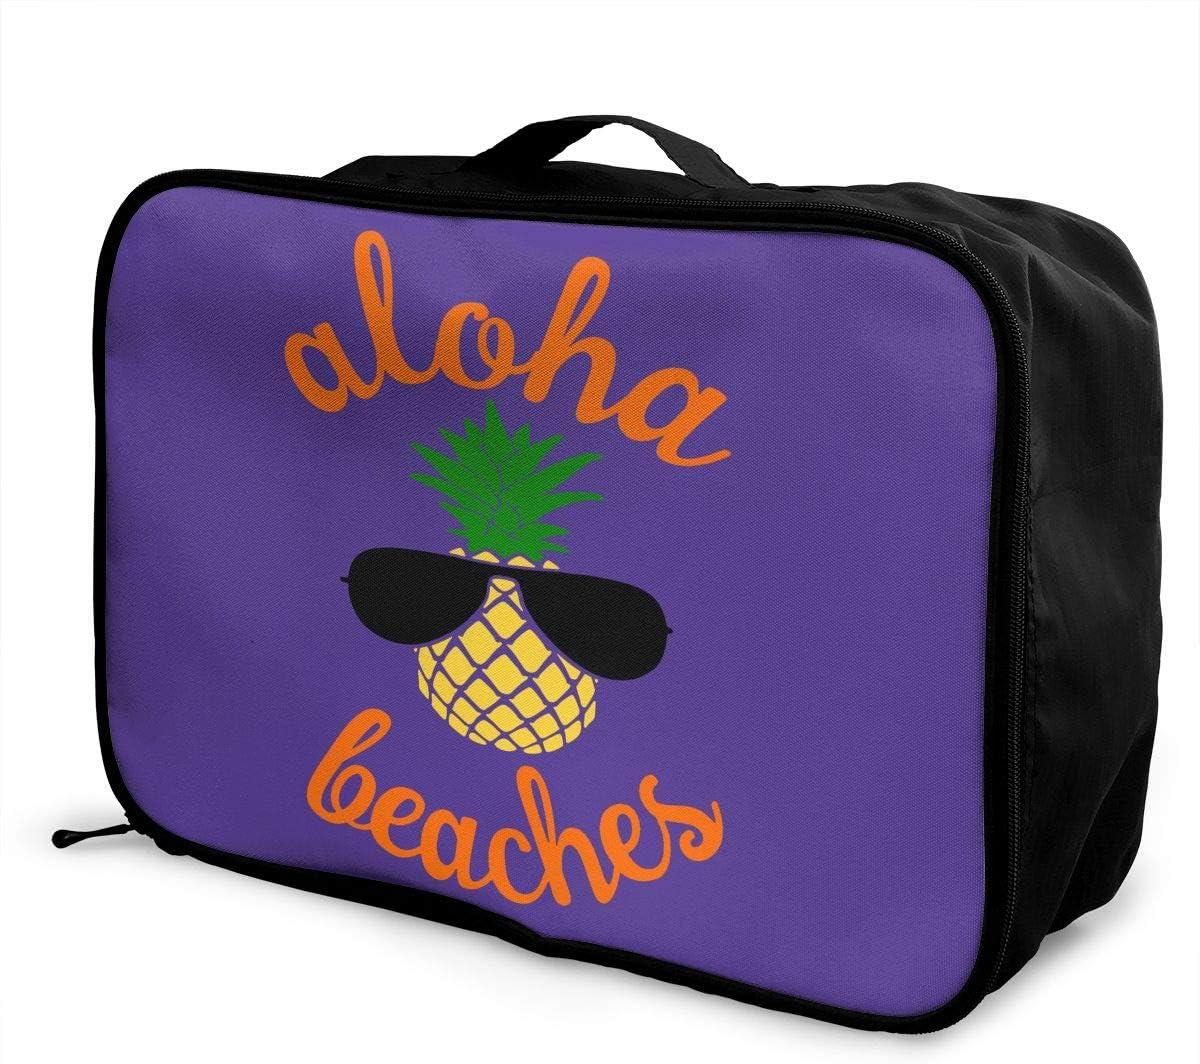 Aloha Sale special price Beaches Pineapple Hawaii Seasonal Wrap Introduction Capacity Lightweight Large Carry